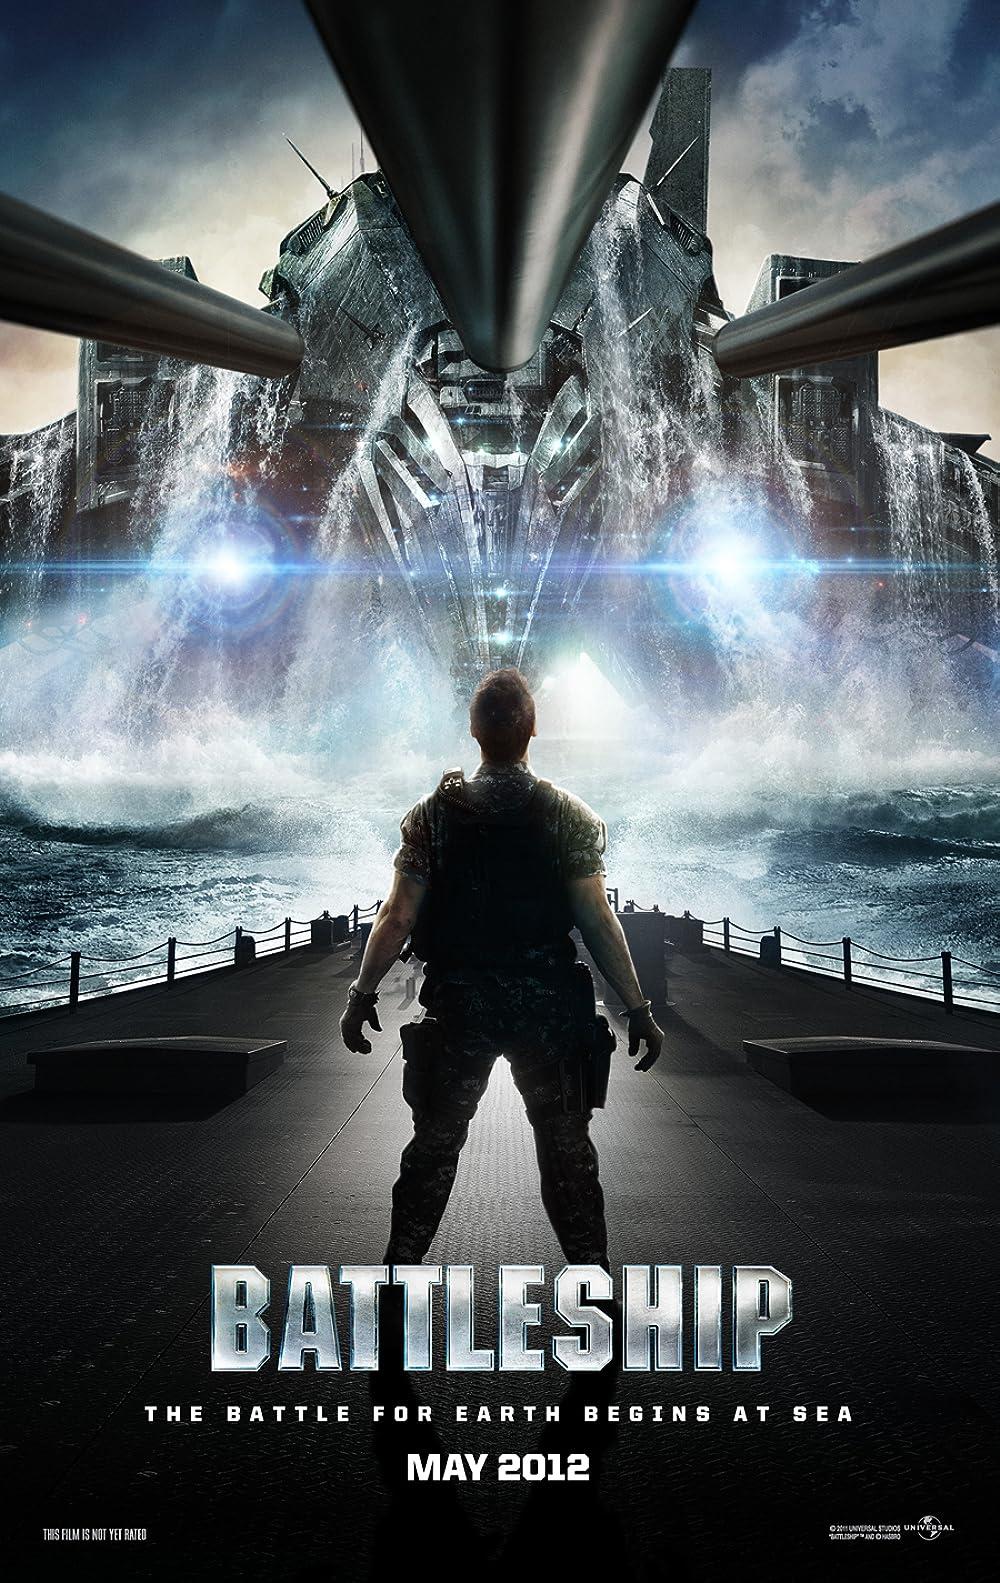 m.imdb.com